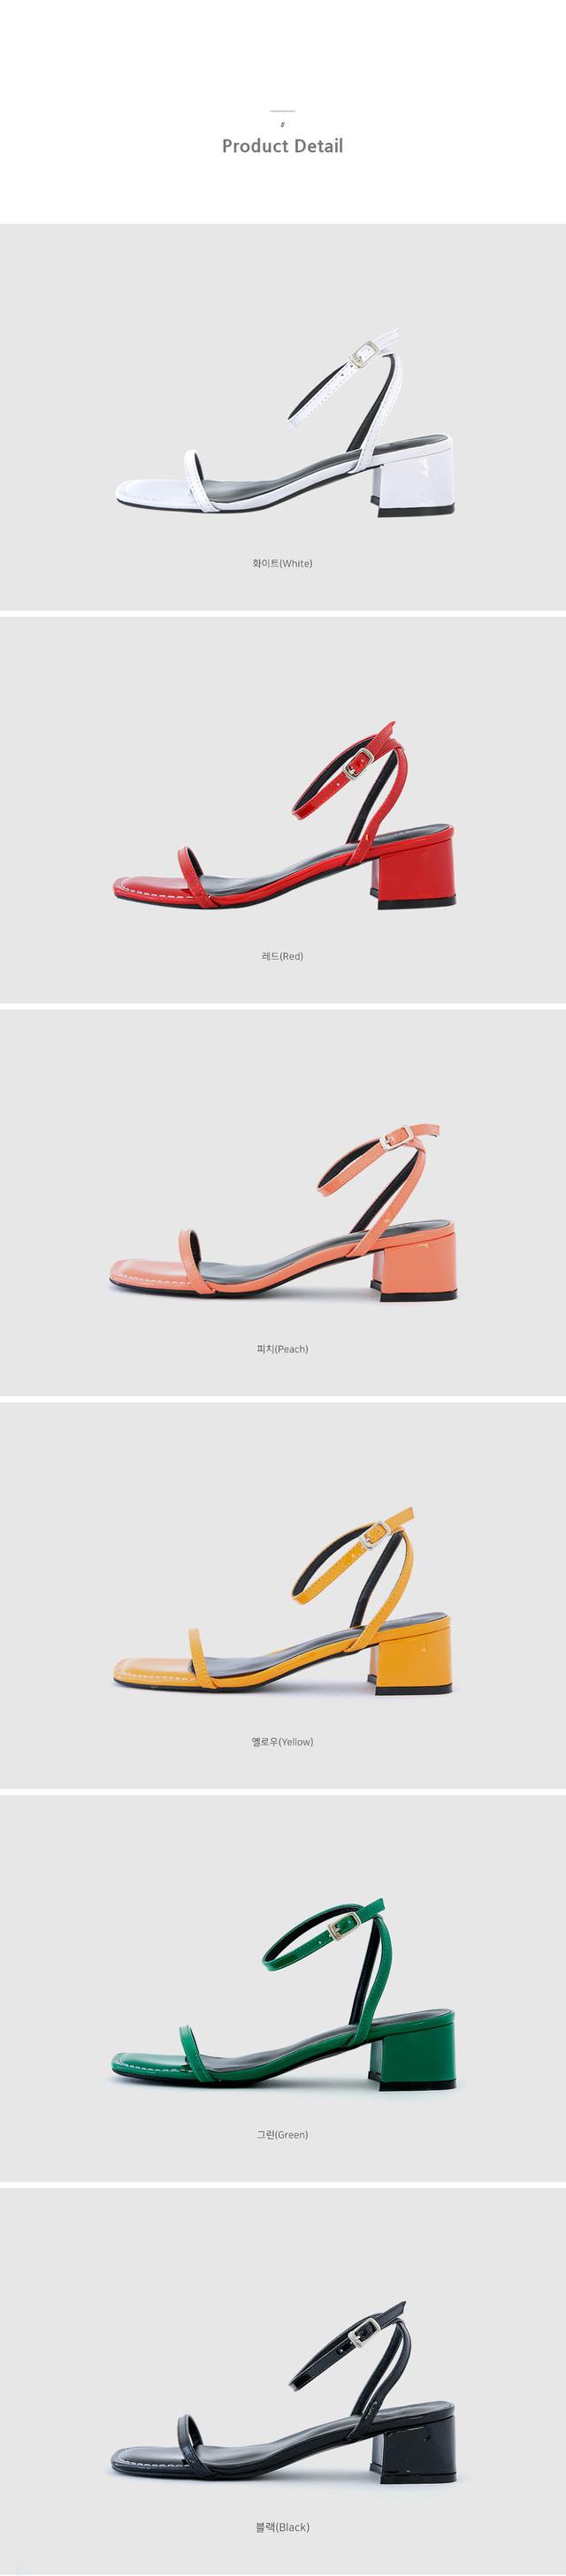 Cushioning strap sandals 4.5cm